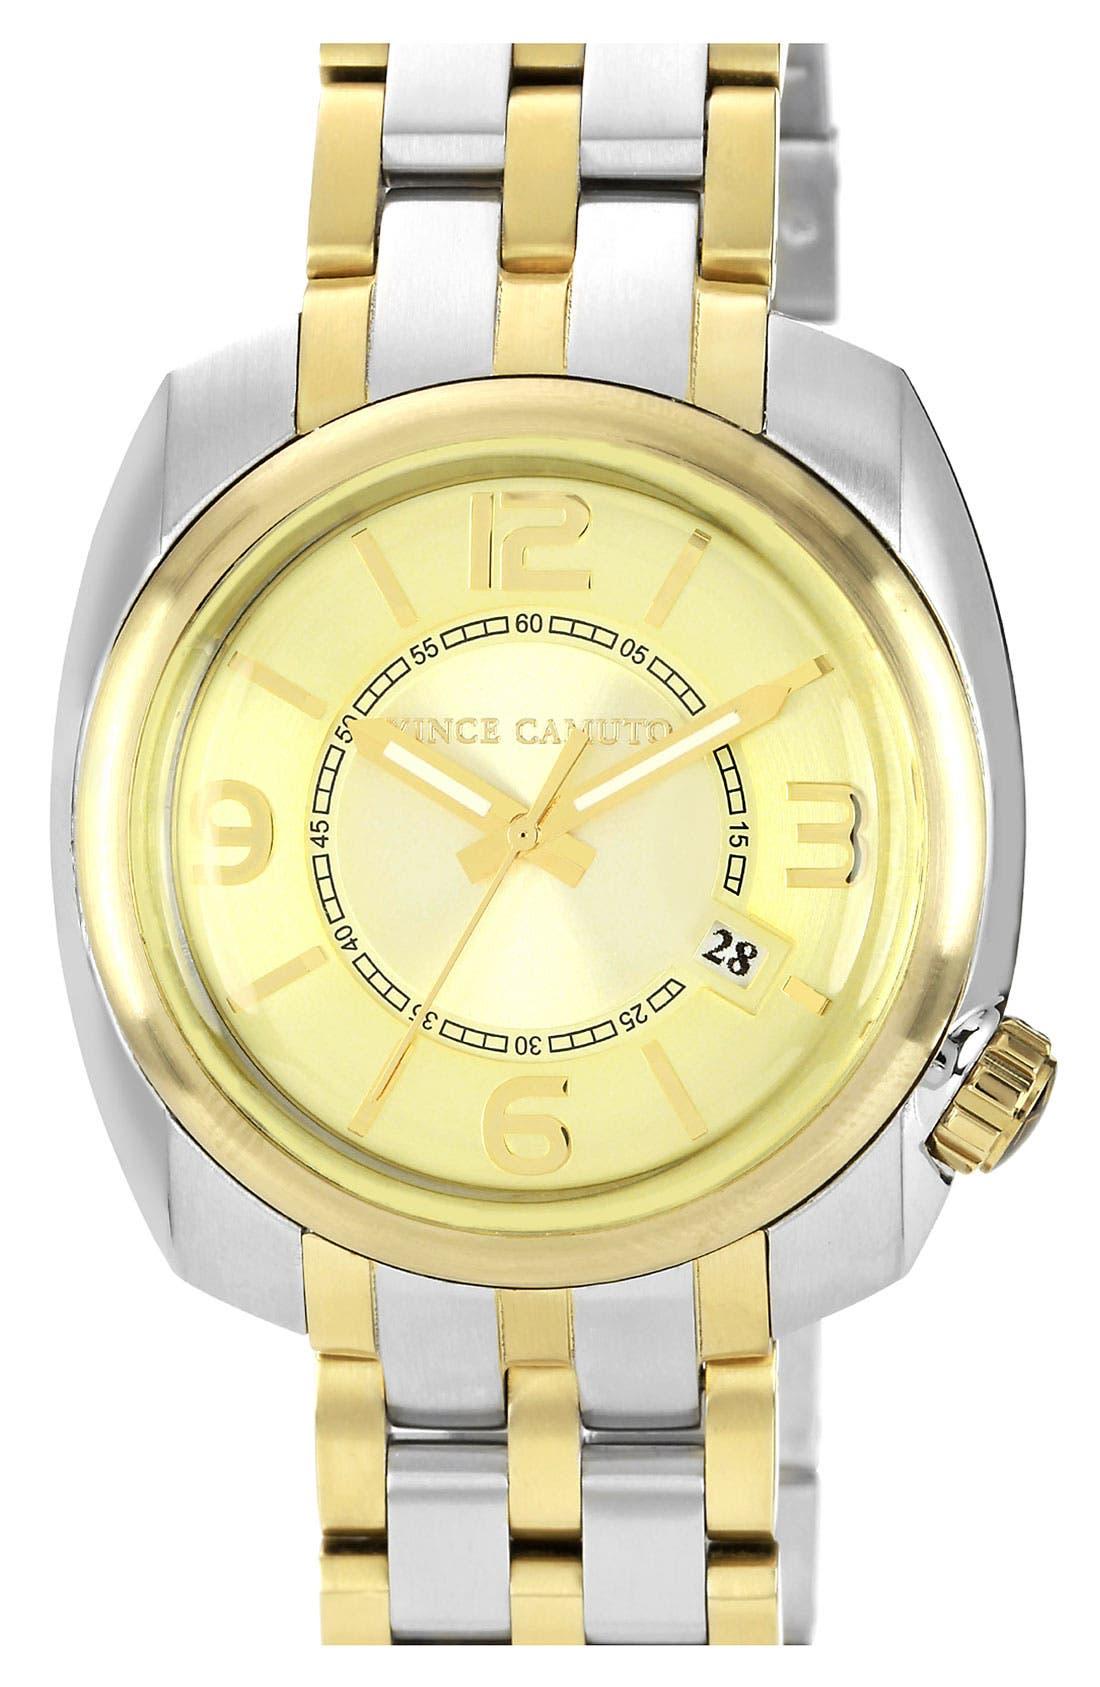 Main Image - Vince Camuto Square Case Bracelet Watch, 42mm